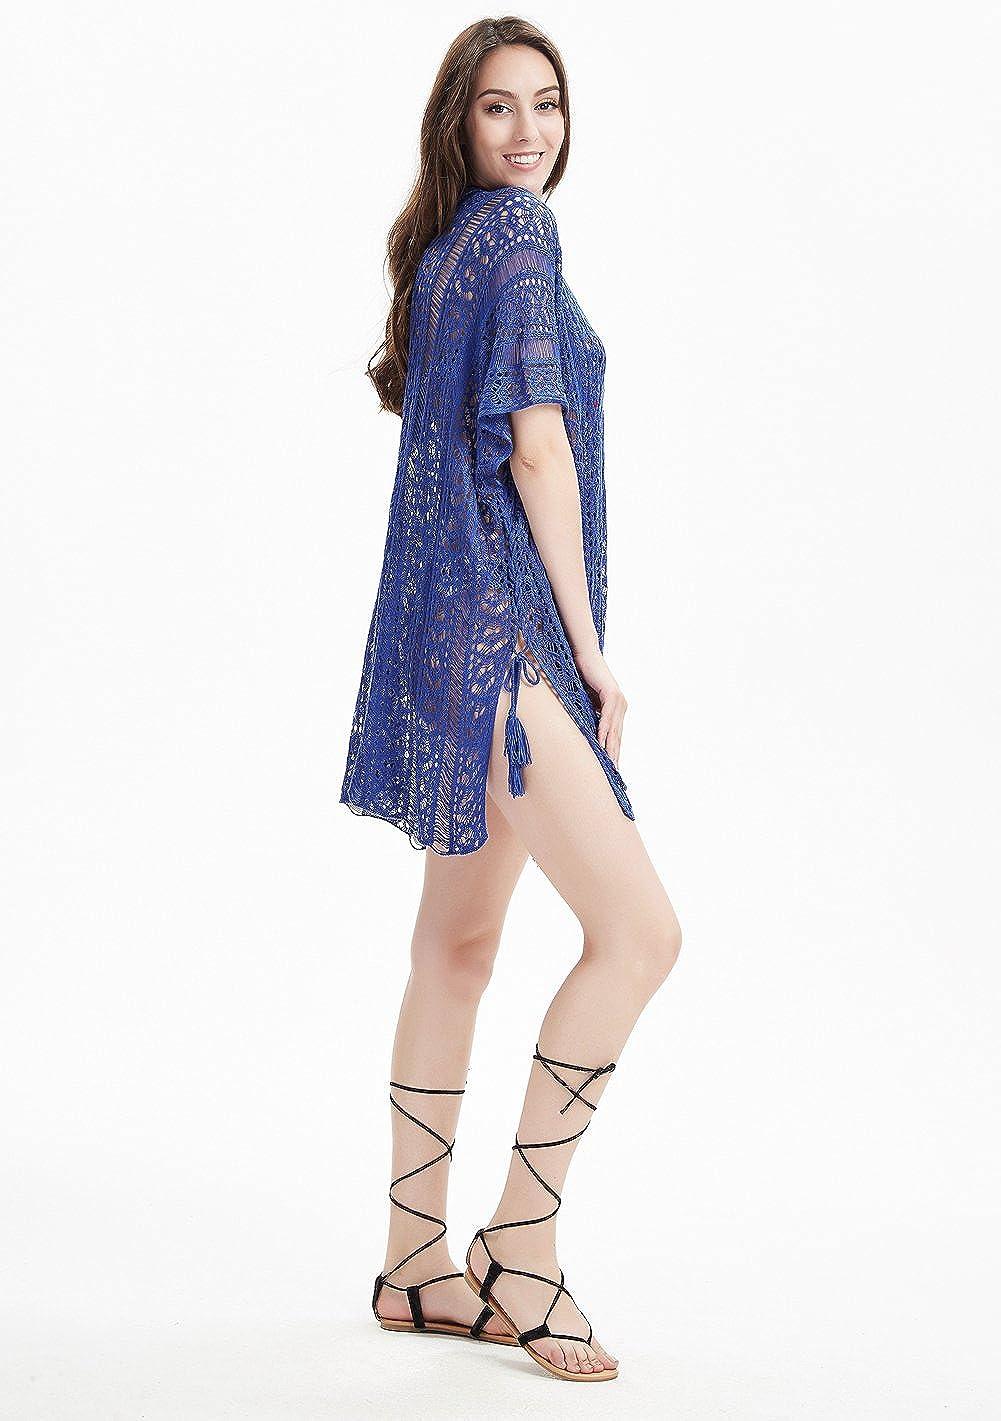 Ferand - Vestido Sexy De Playa Verano Crochet Camisola para Bikini ...